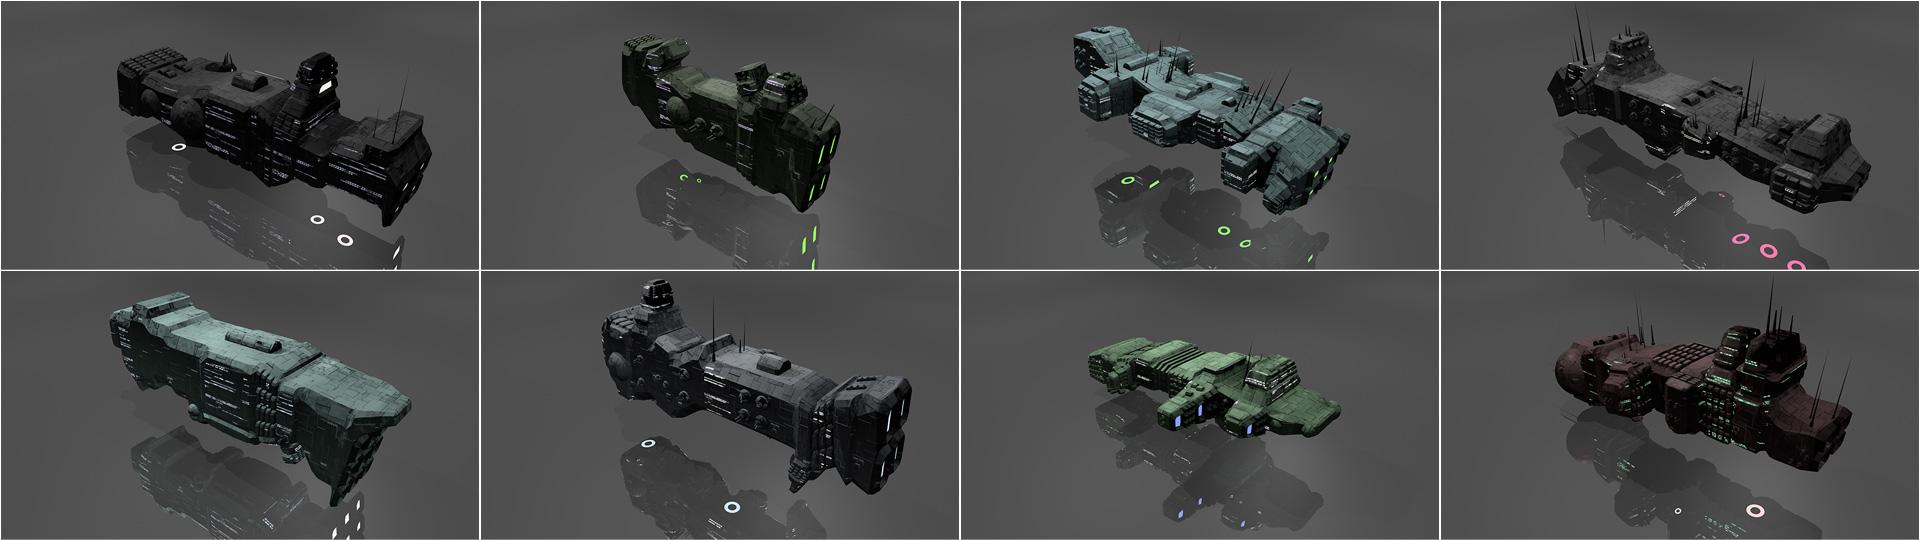 spaceship generator blendernation